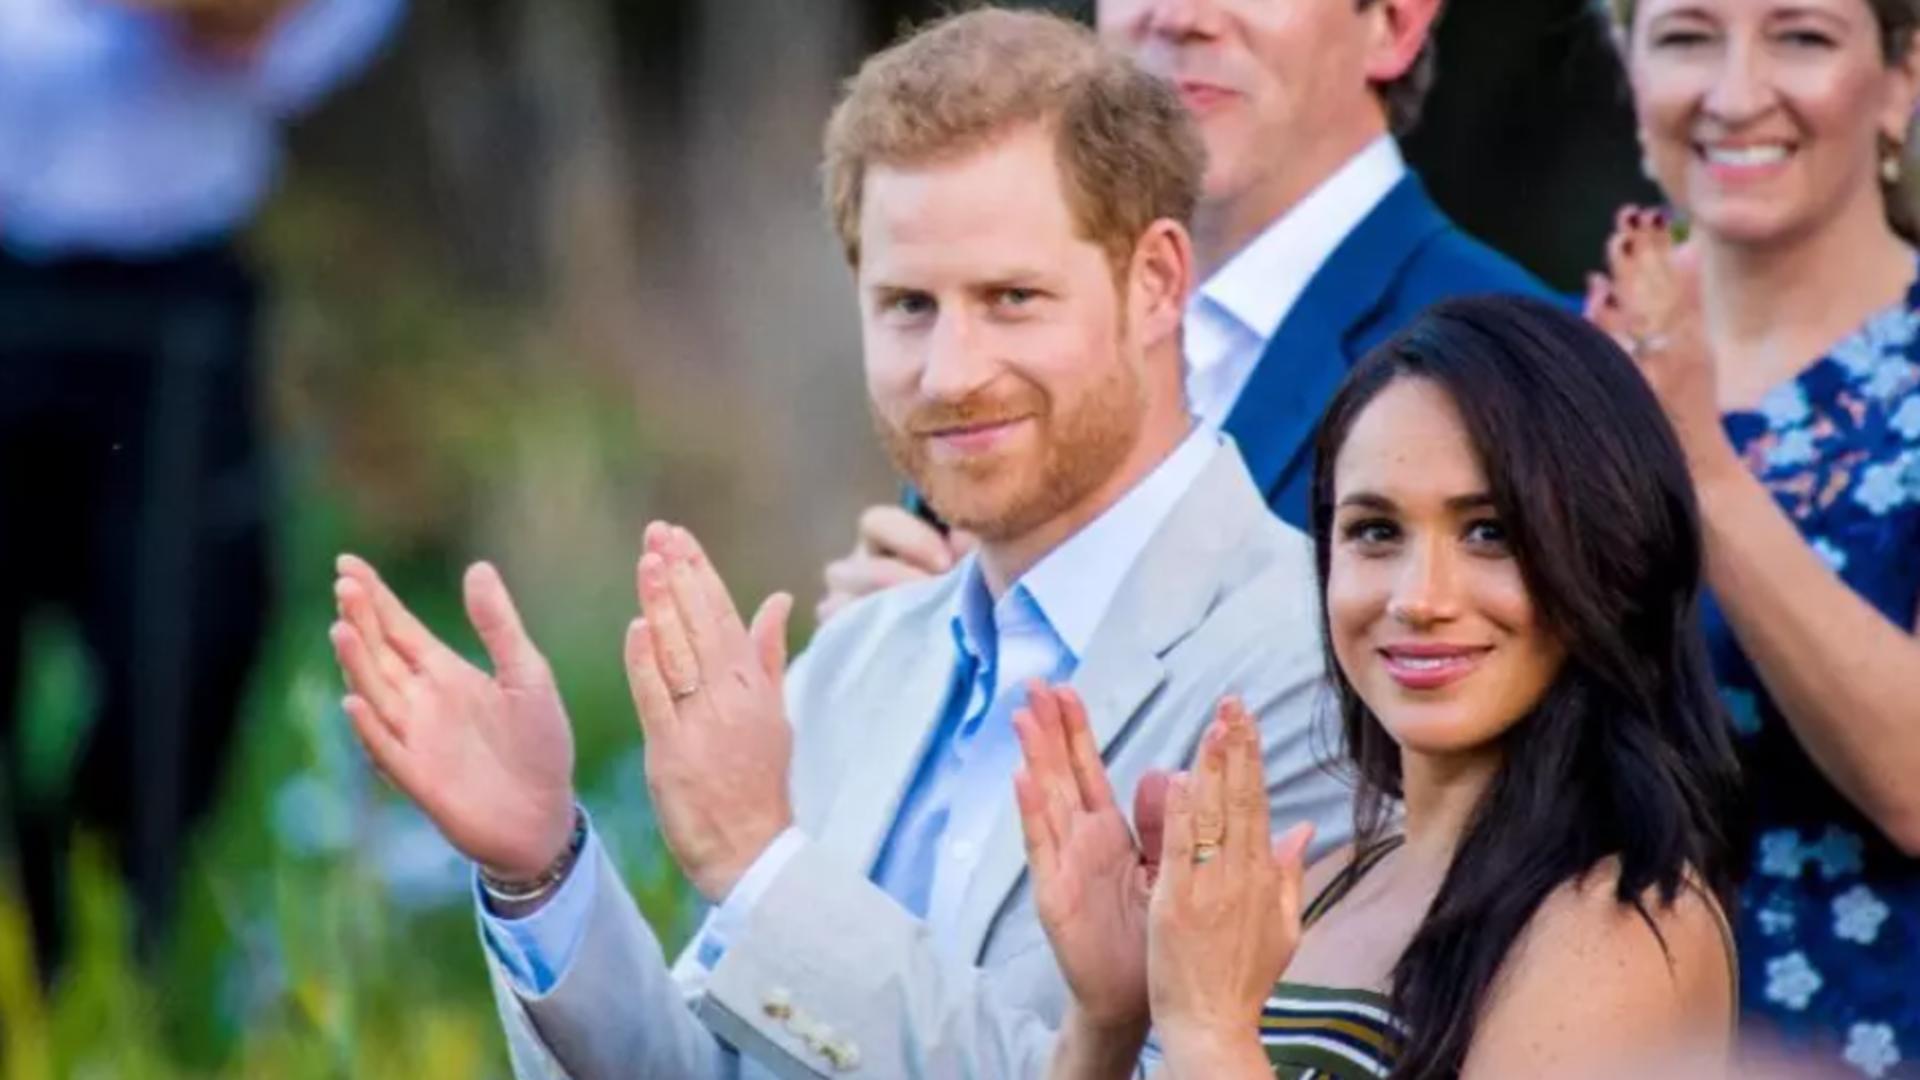 Prințul Harry și Meghan Markle. Foto: Profi Media